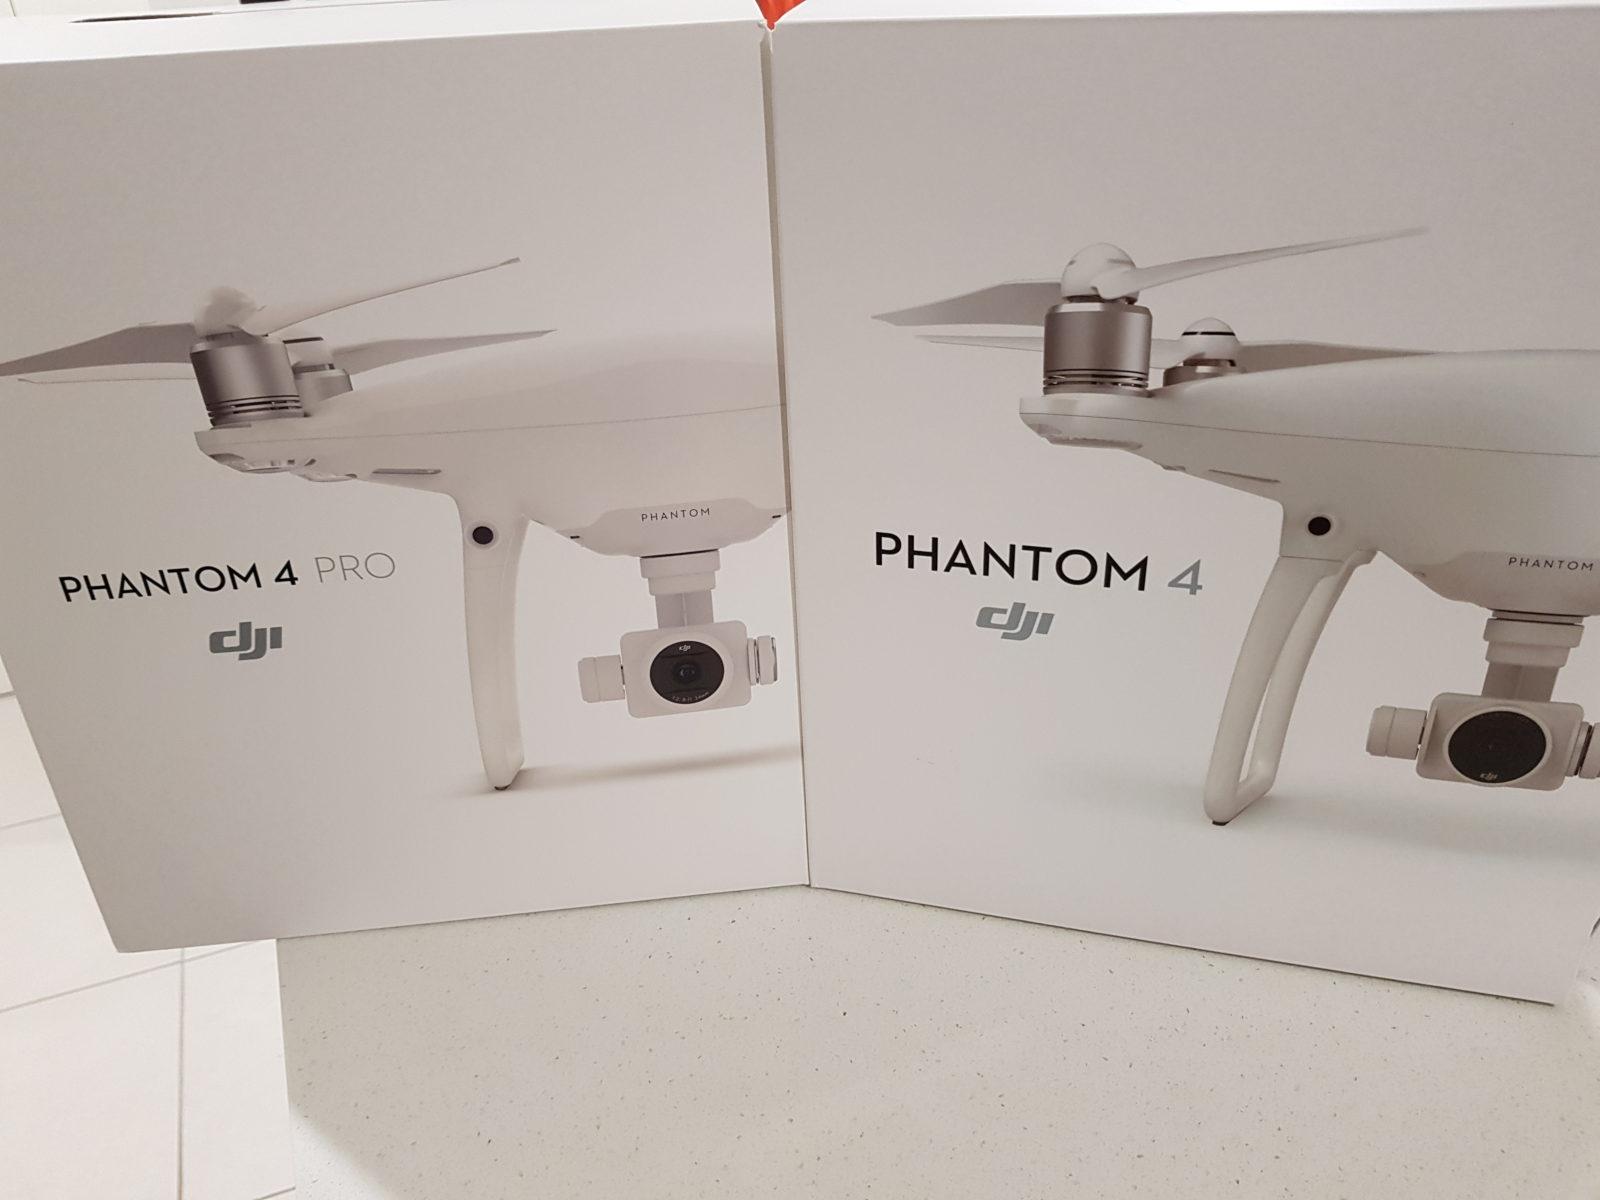 Brisbane Drone Photography